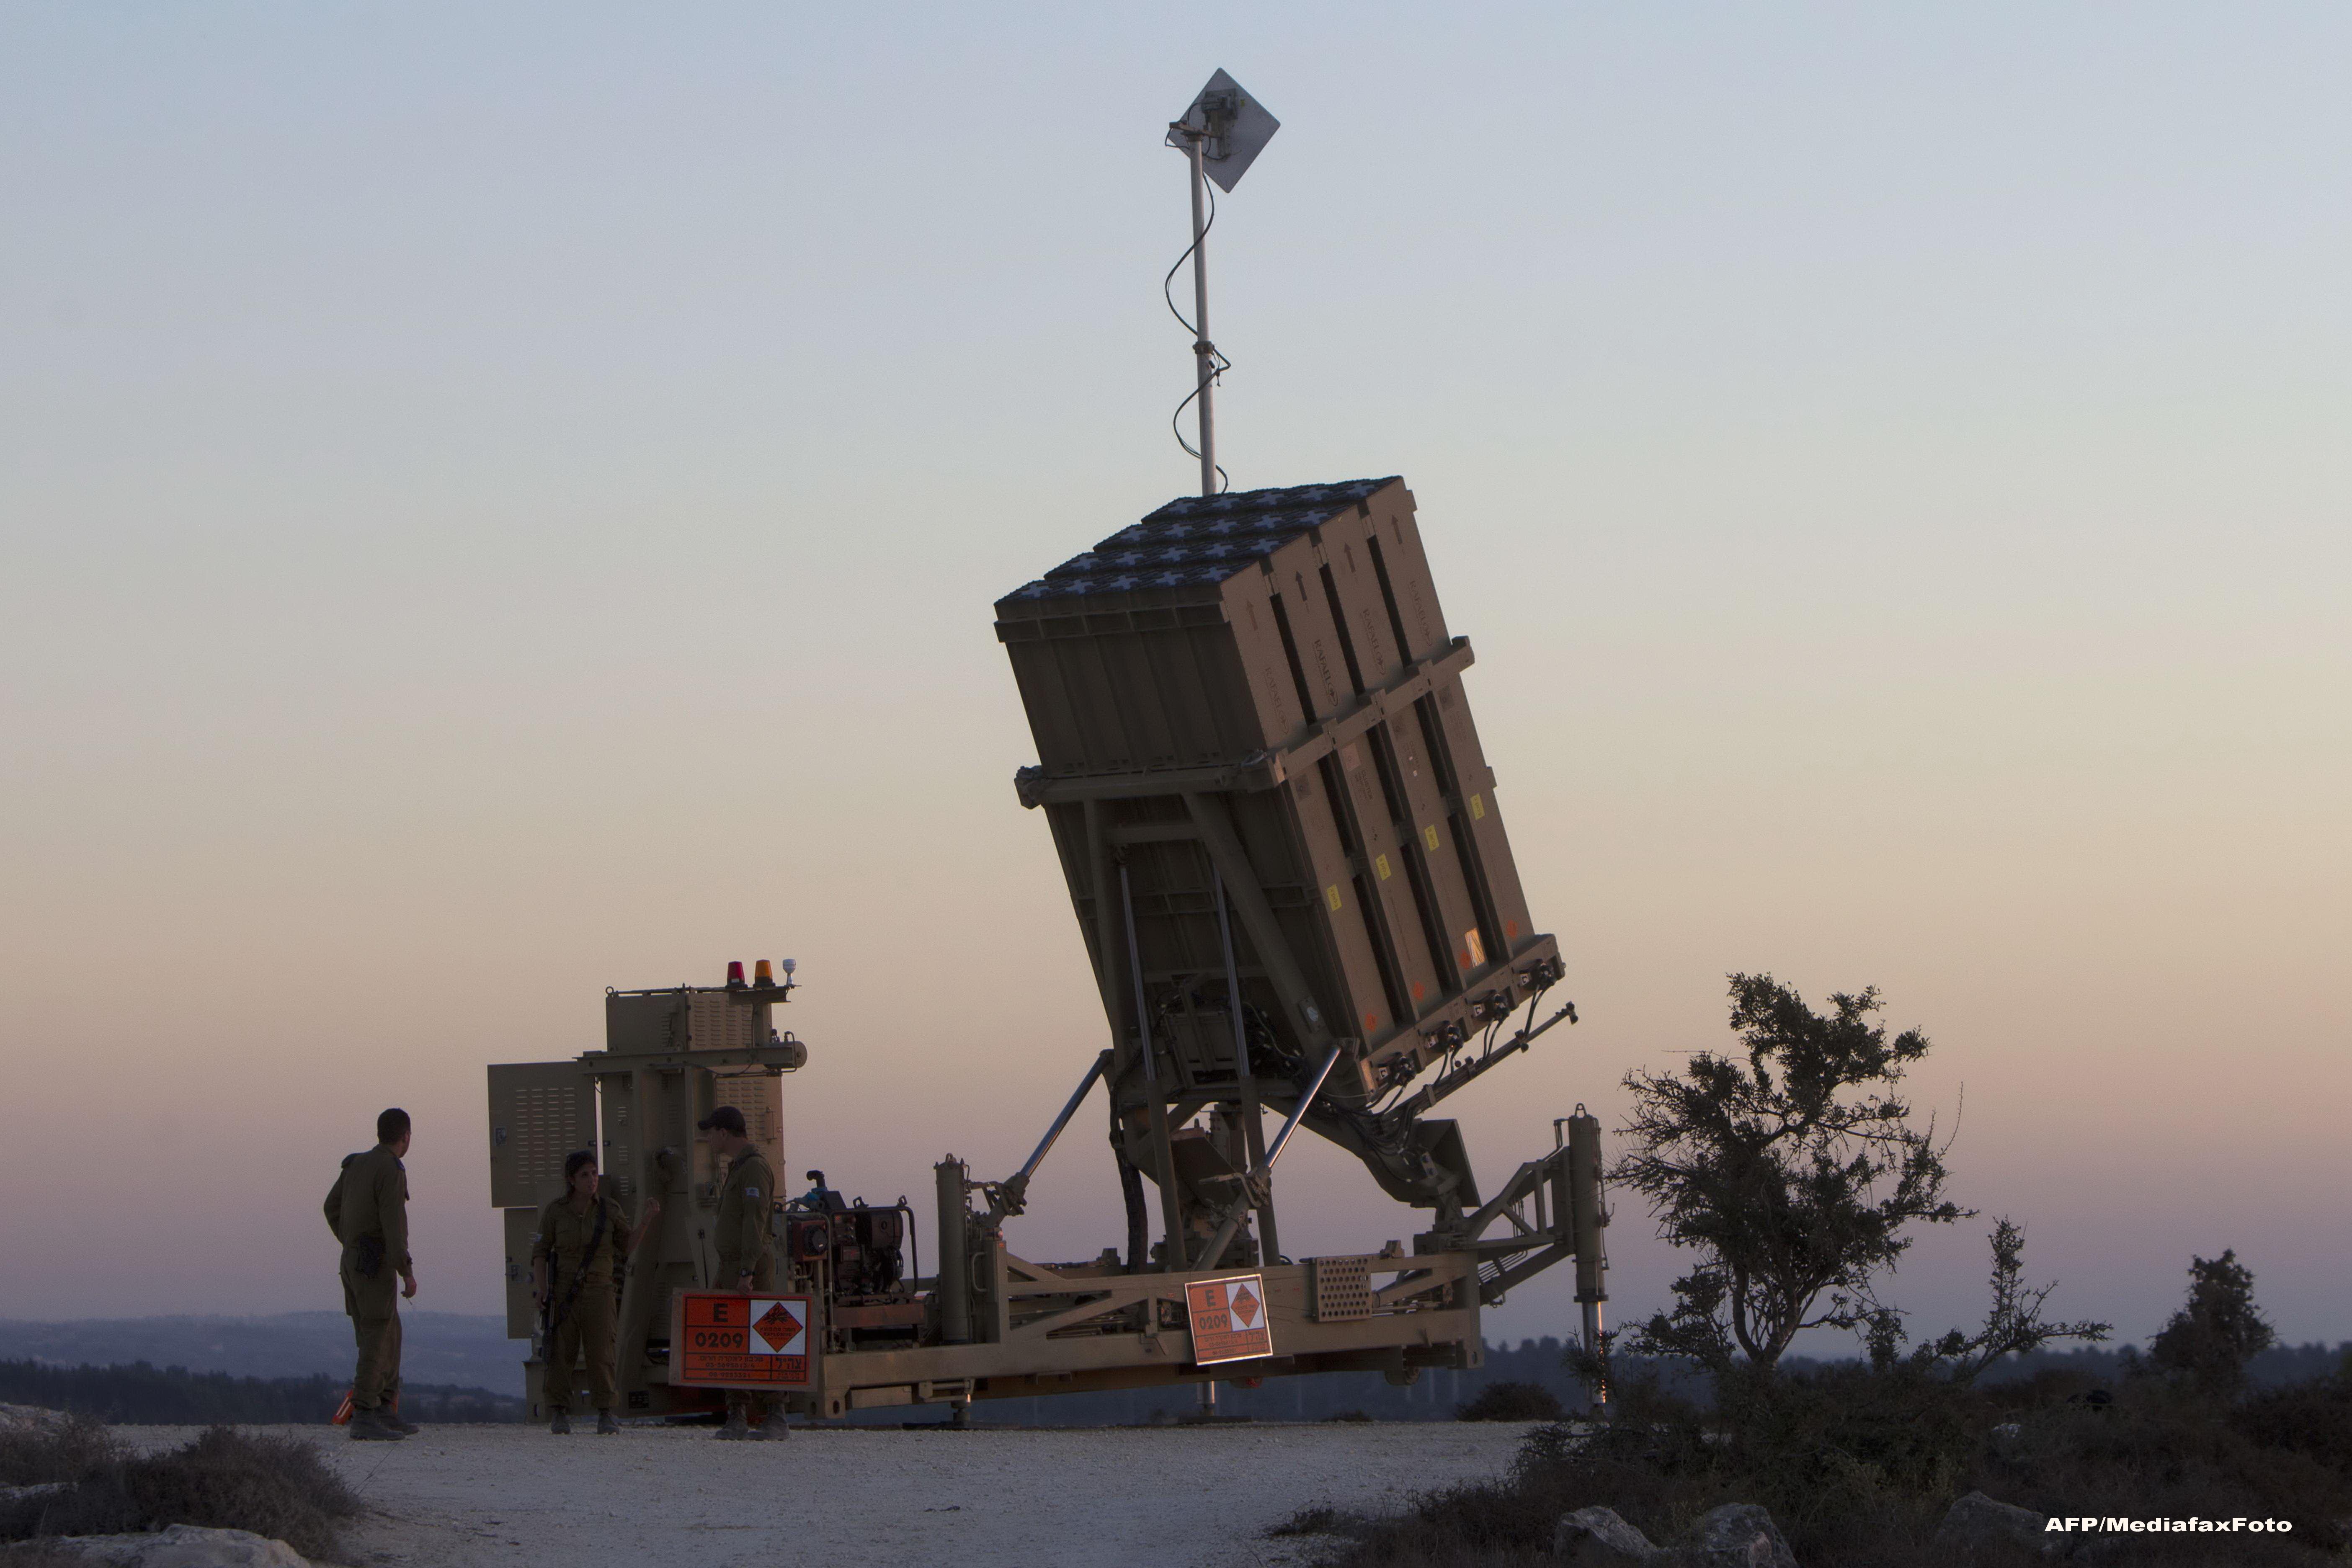 Israelul se lauda ca a dezvoltat o tehnologie militara ca in Razboiul Stelelor: